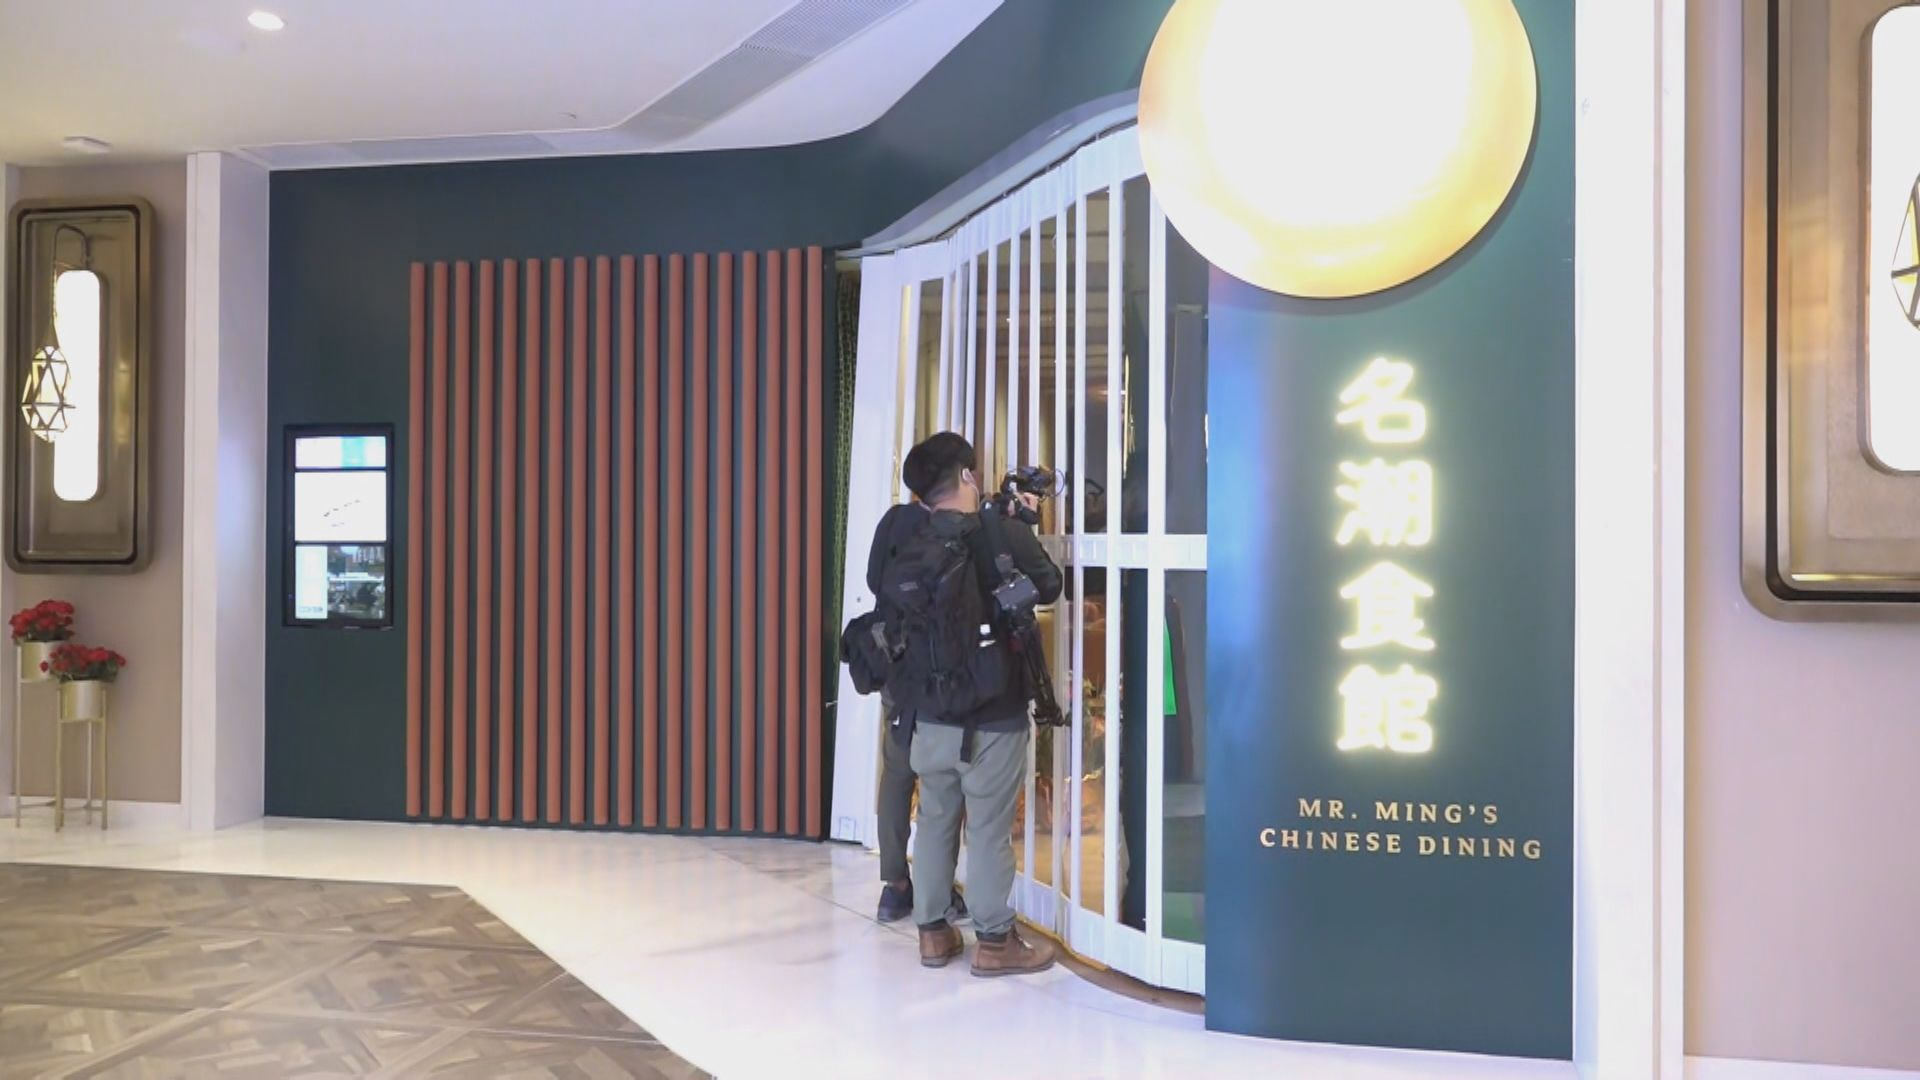 K11 Musea名潮食館多人感染 當局疑出現傳播